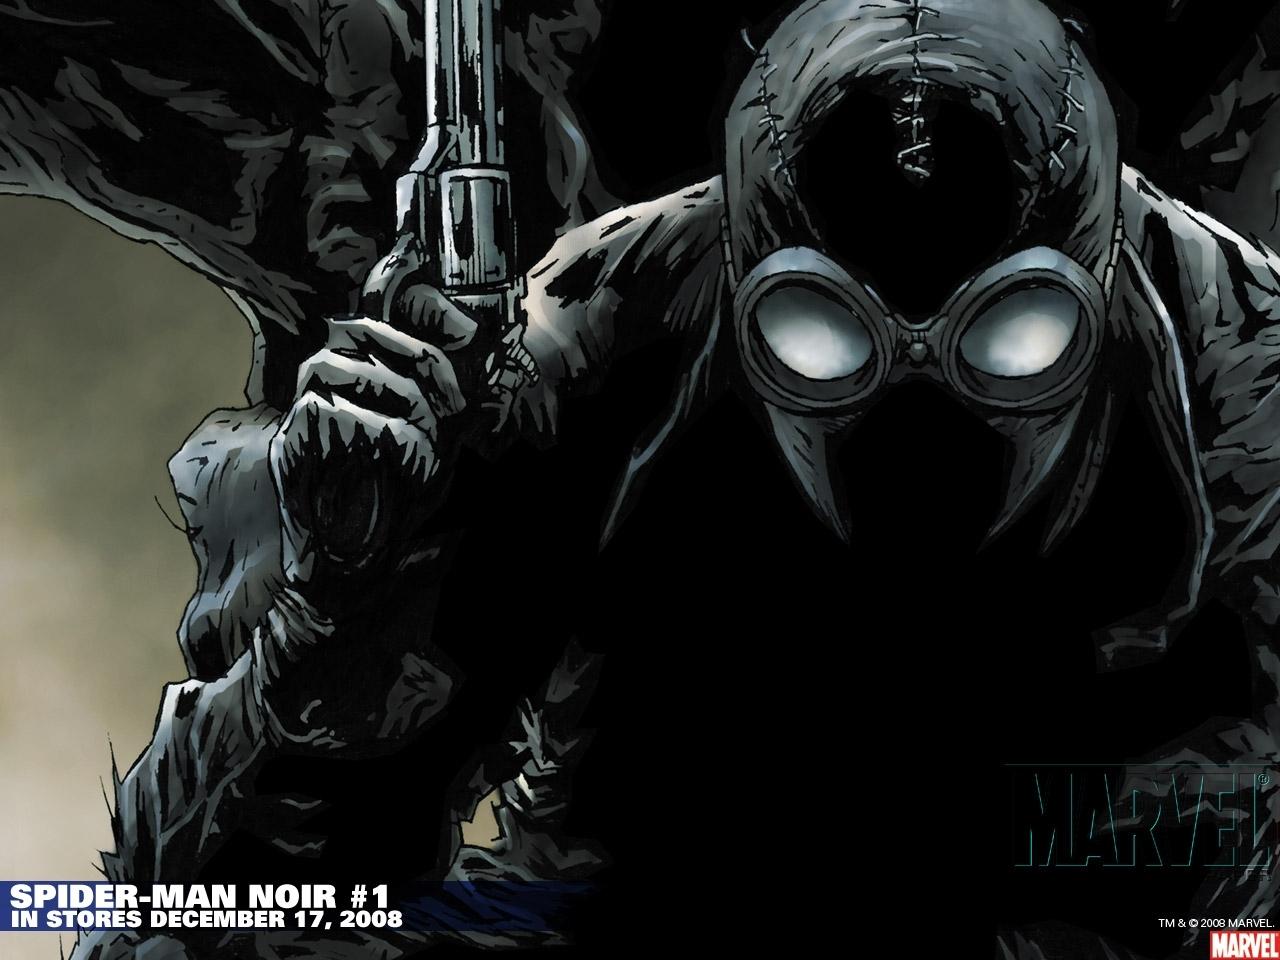 Épinglé par luke straughan sur spider-man | pinterest | noir